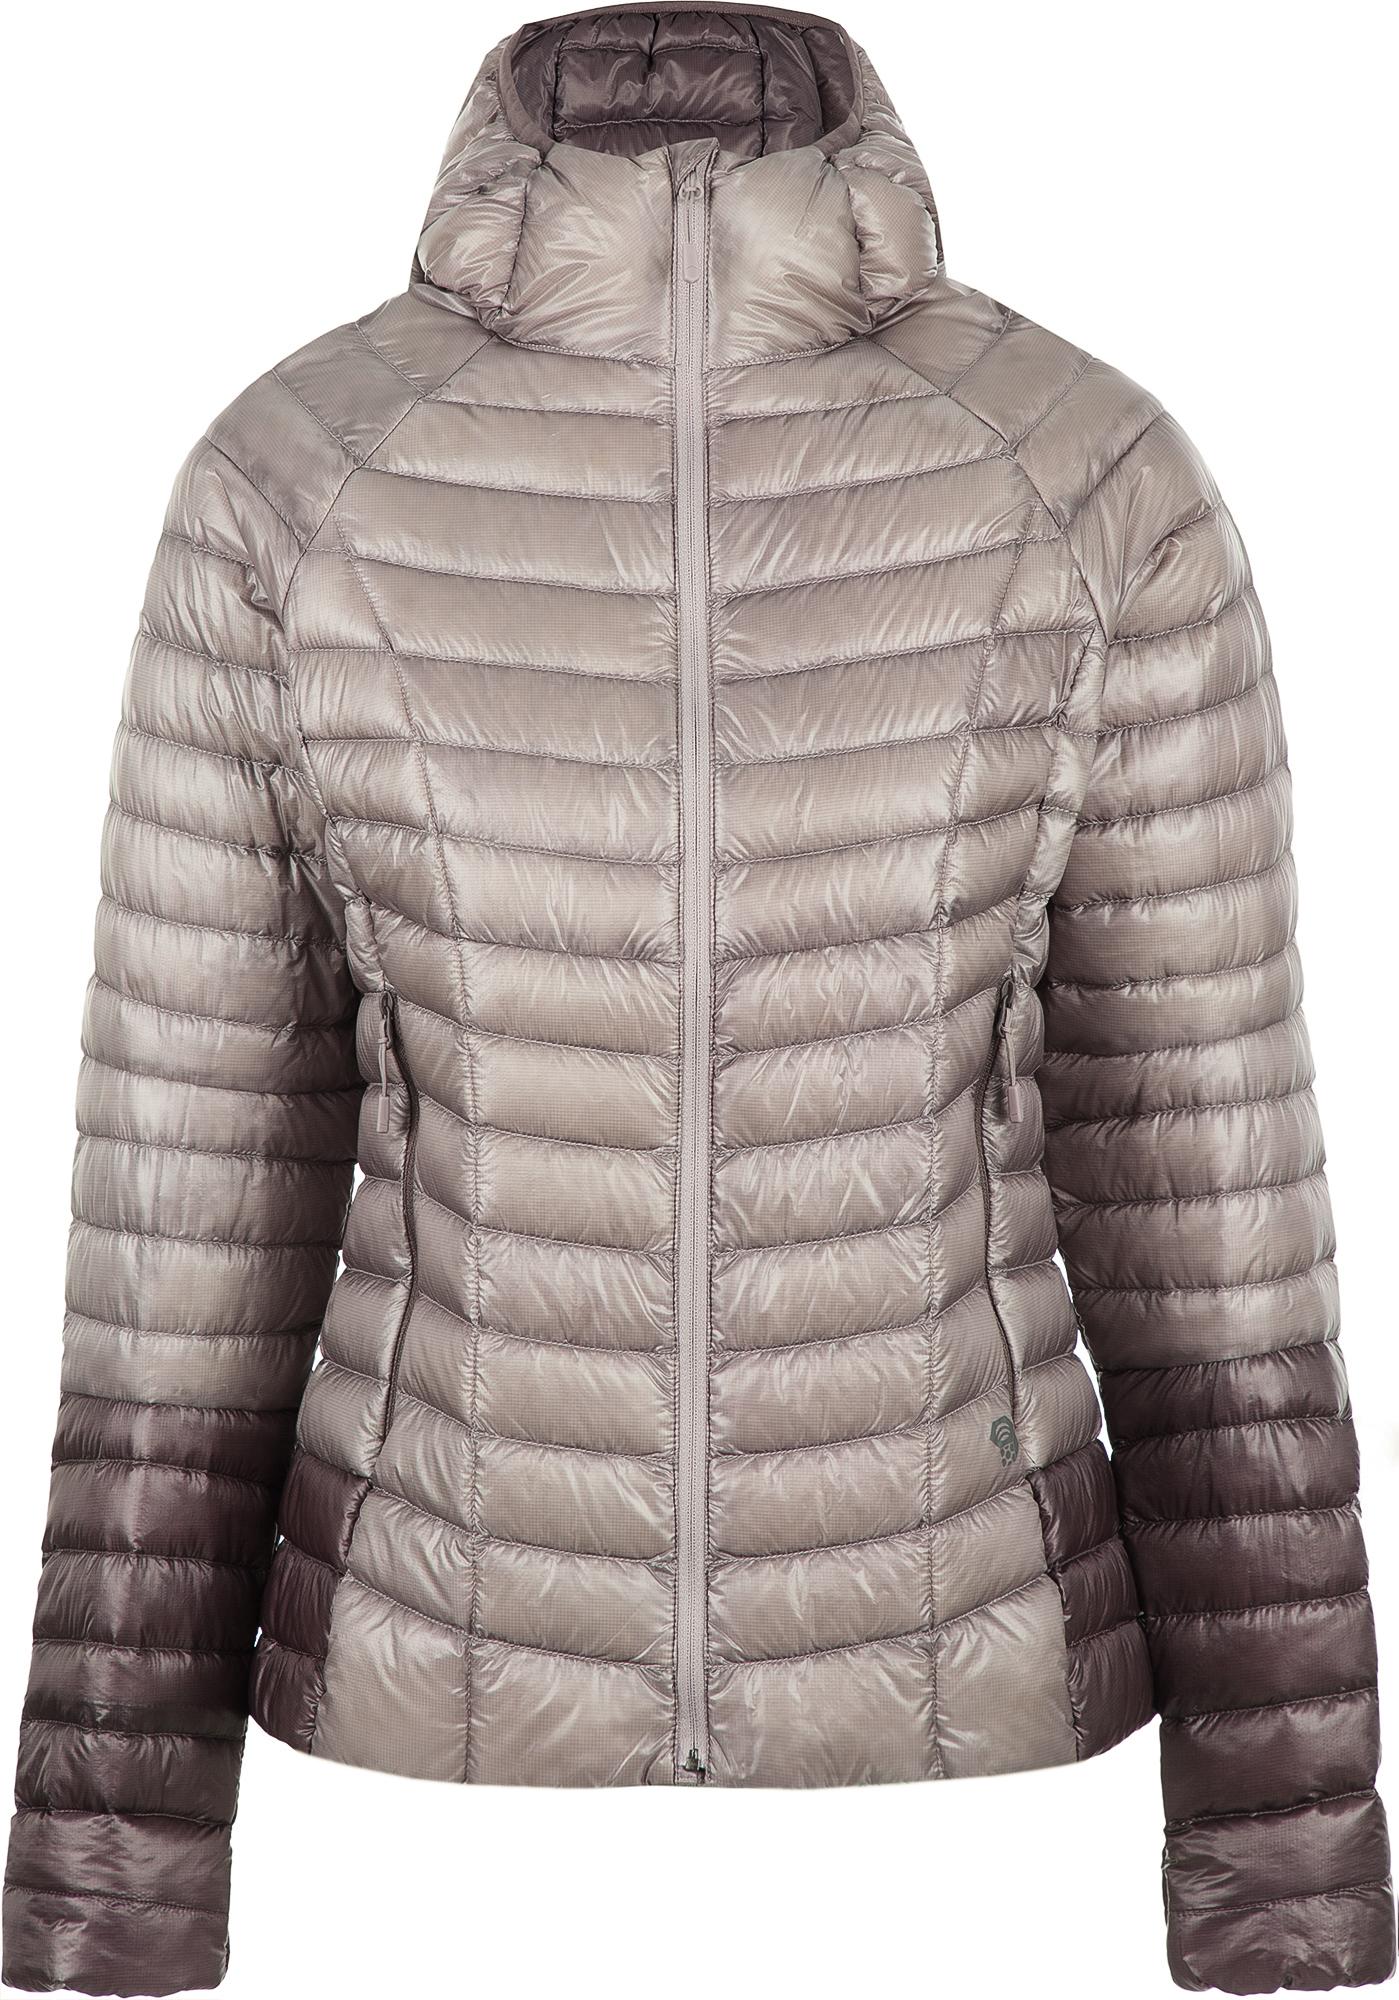 Mountain Hardwear Куртка пуховая женская Mountain Hardwear Ghost Whisperer/2™, размер 50 цена